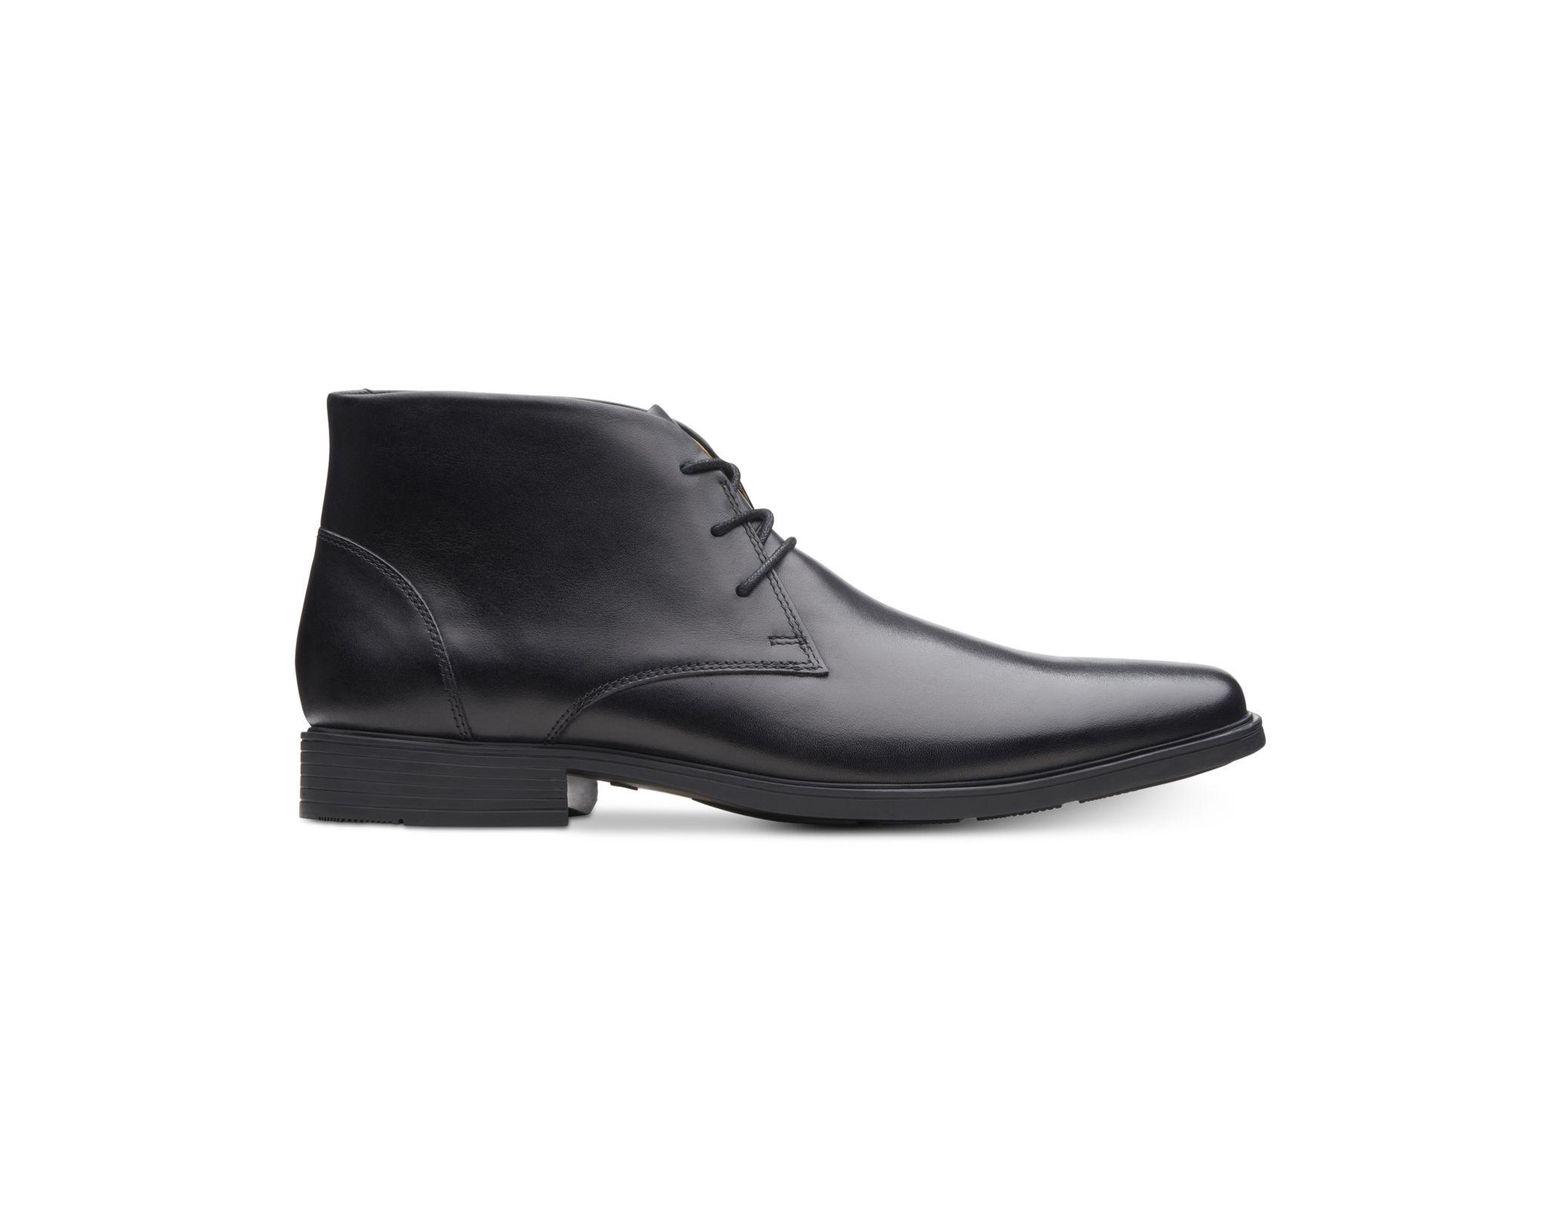 f72834adc933a Lyst - Clarks Tilden Top Waterproof Dress Chukka Boots in Black for Men